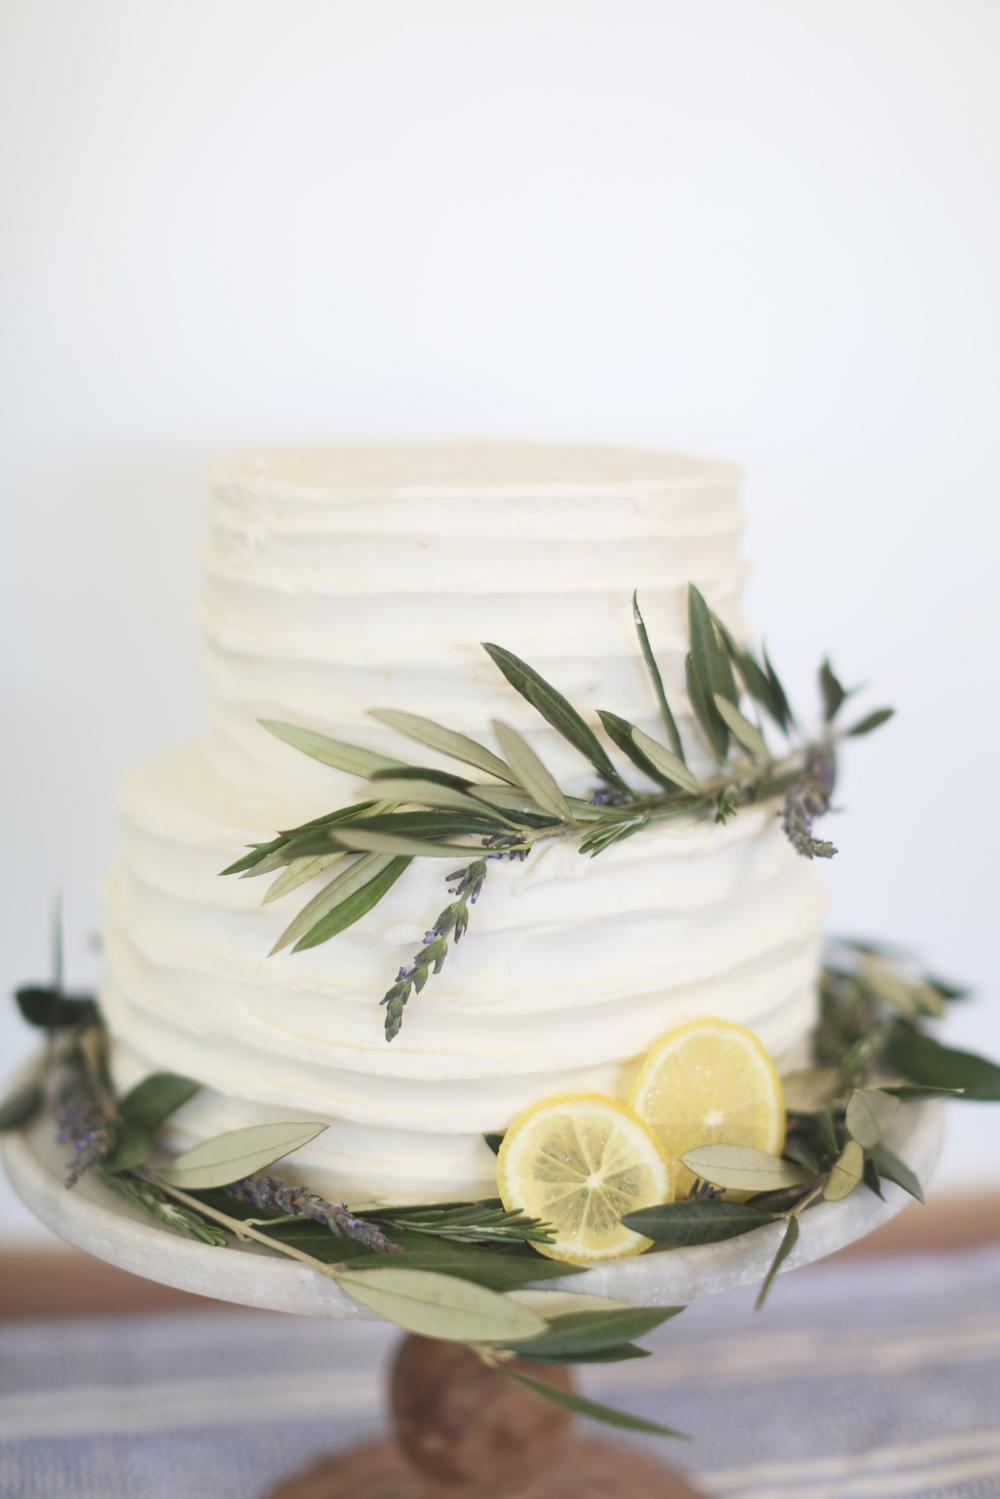 Lemon Lavender Tiered Cake                                                                                          Photo Credit Stacy Salvatori